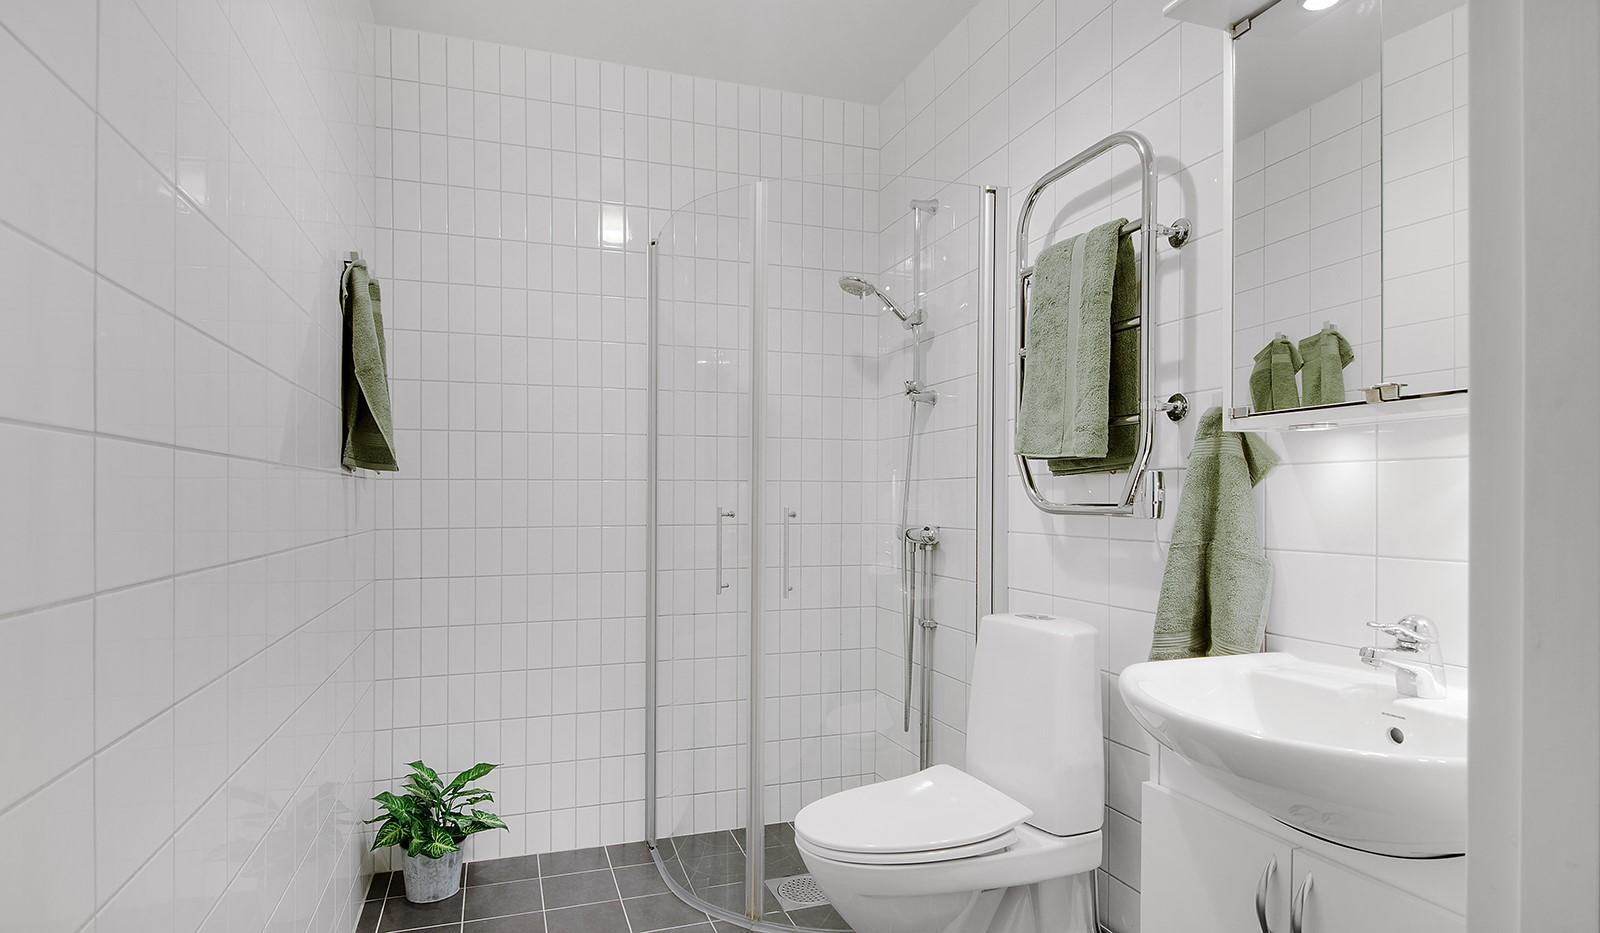 Grönbrinksgatan 6, 4tr - Badrum utrustat med dusch